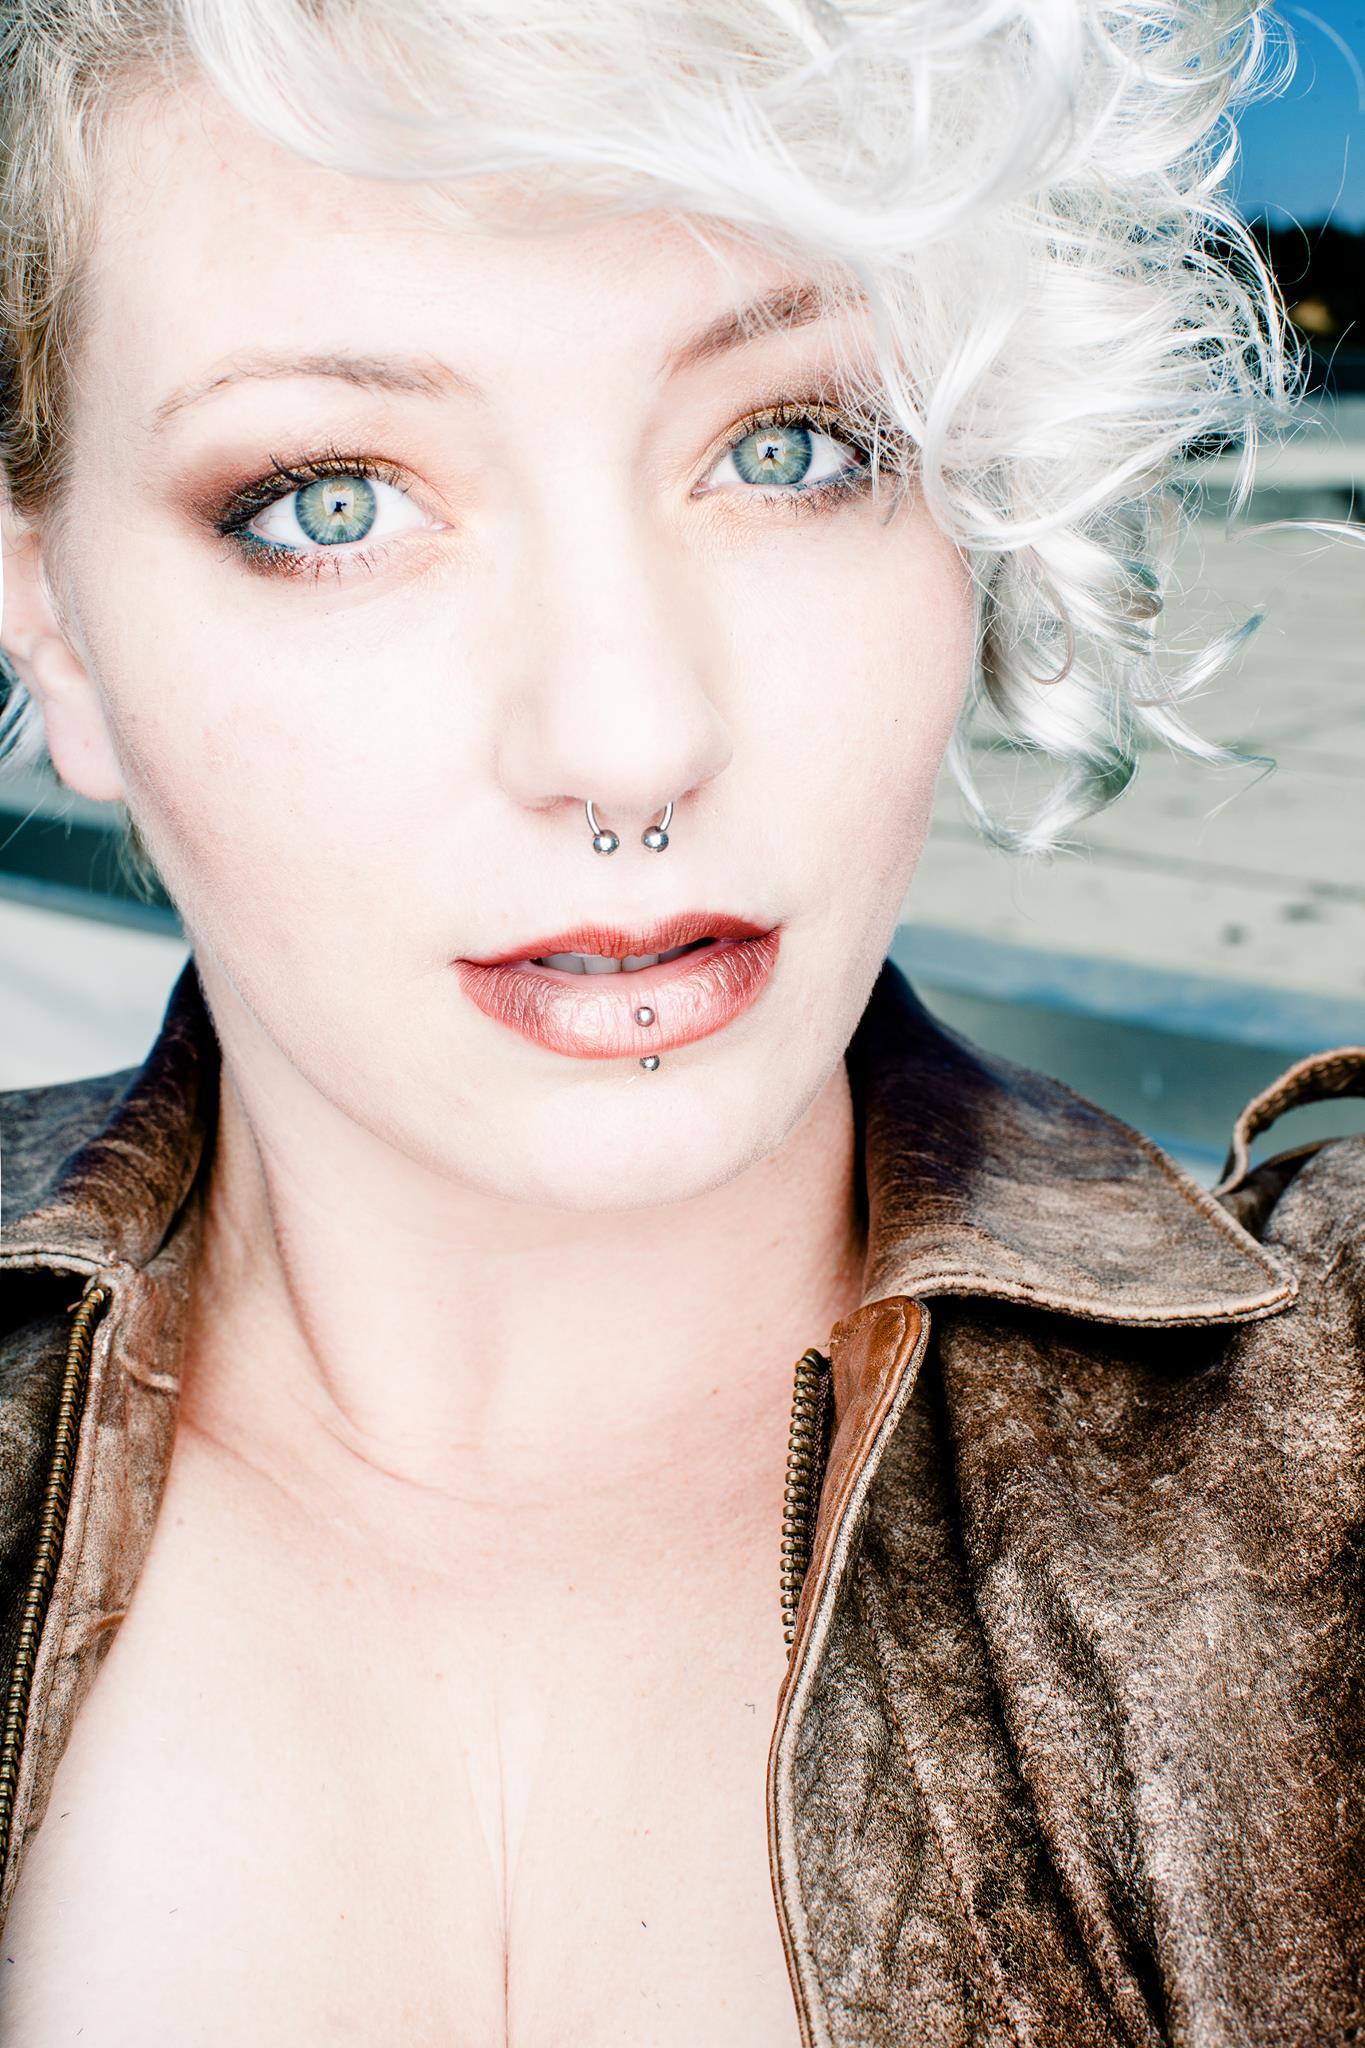 Musician Photographer Elle Jaye Joins Serenity Drums On U.K. Tour e7039803e8